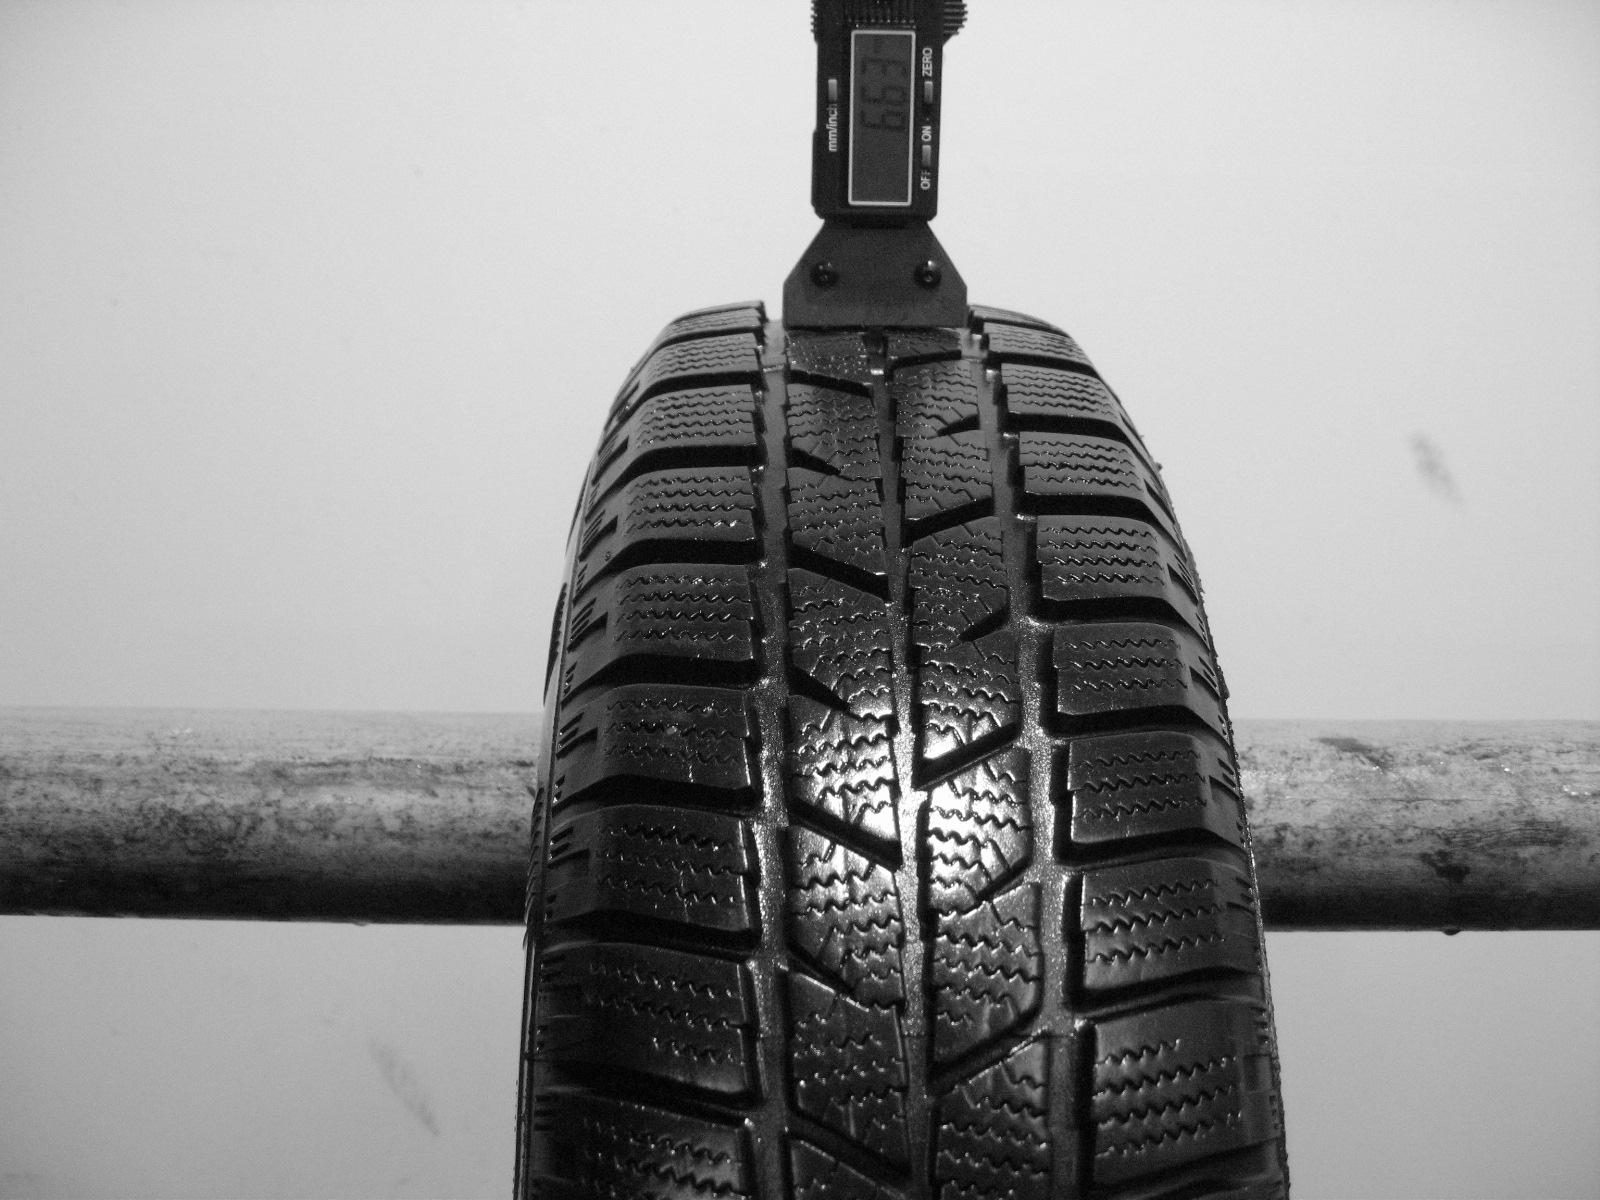 Použité-Pneu-Bazar - 145/80 R13 SEMPERIT TOP-GRIP SLG2-kusovka-rezerva 3mm